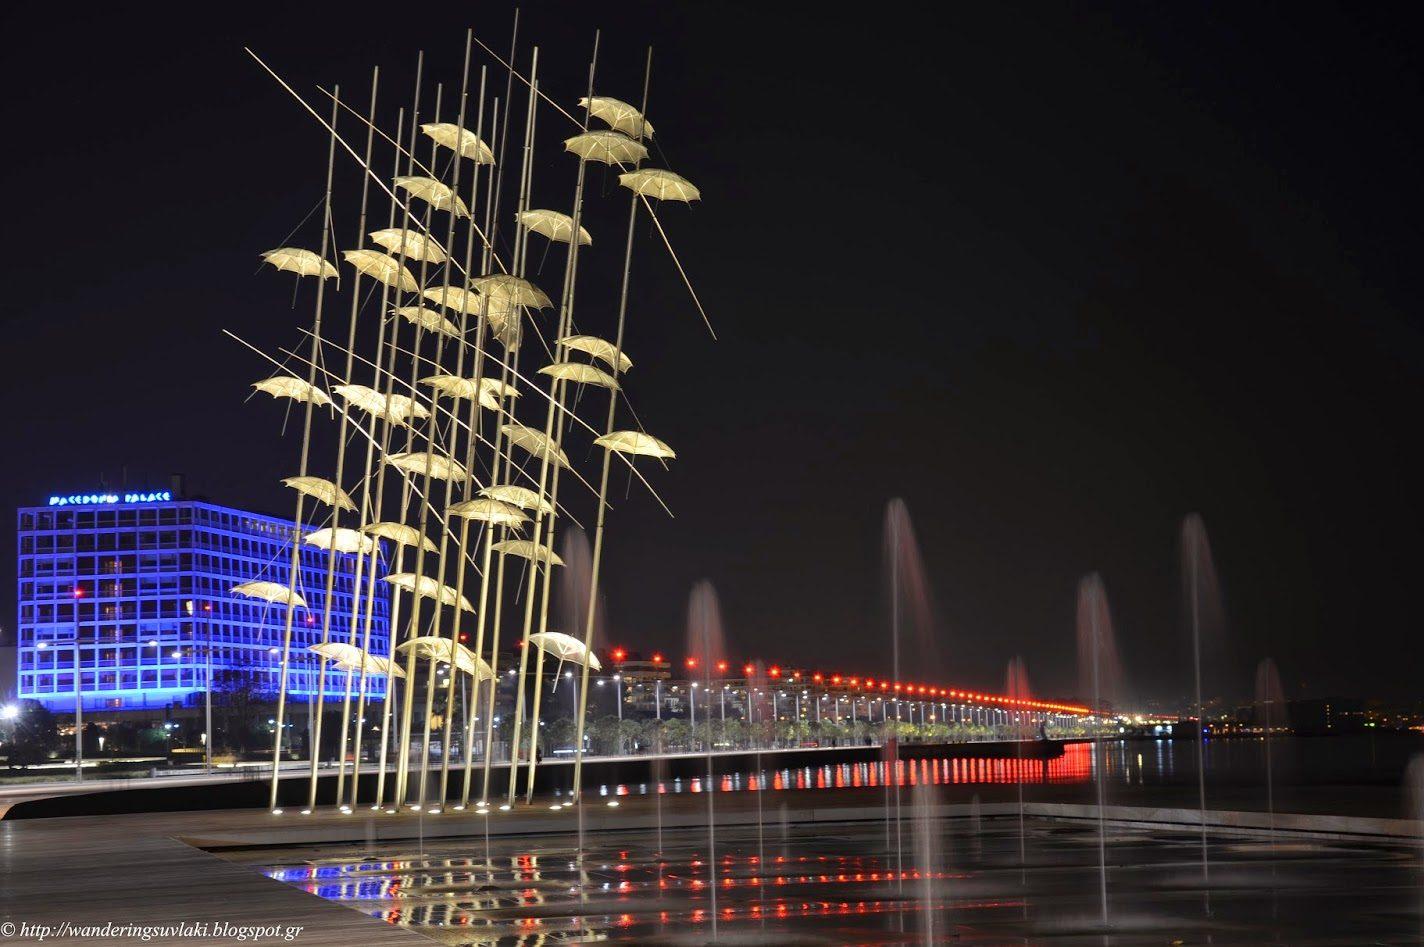 View of the umbrellas sculpture in Thessaloniki